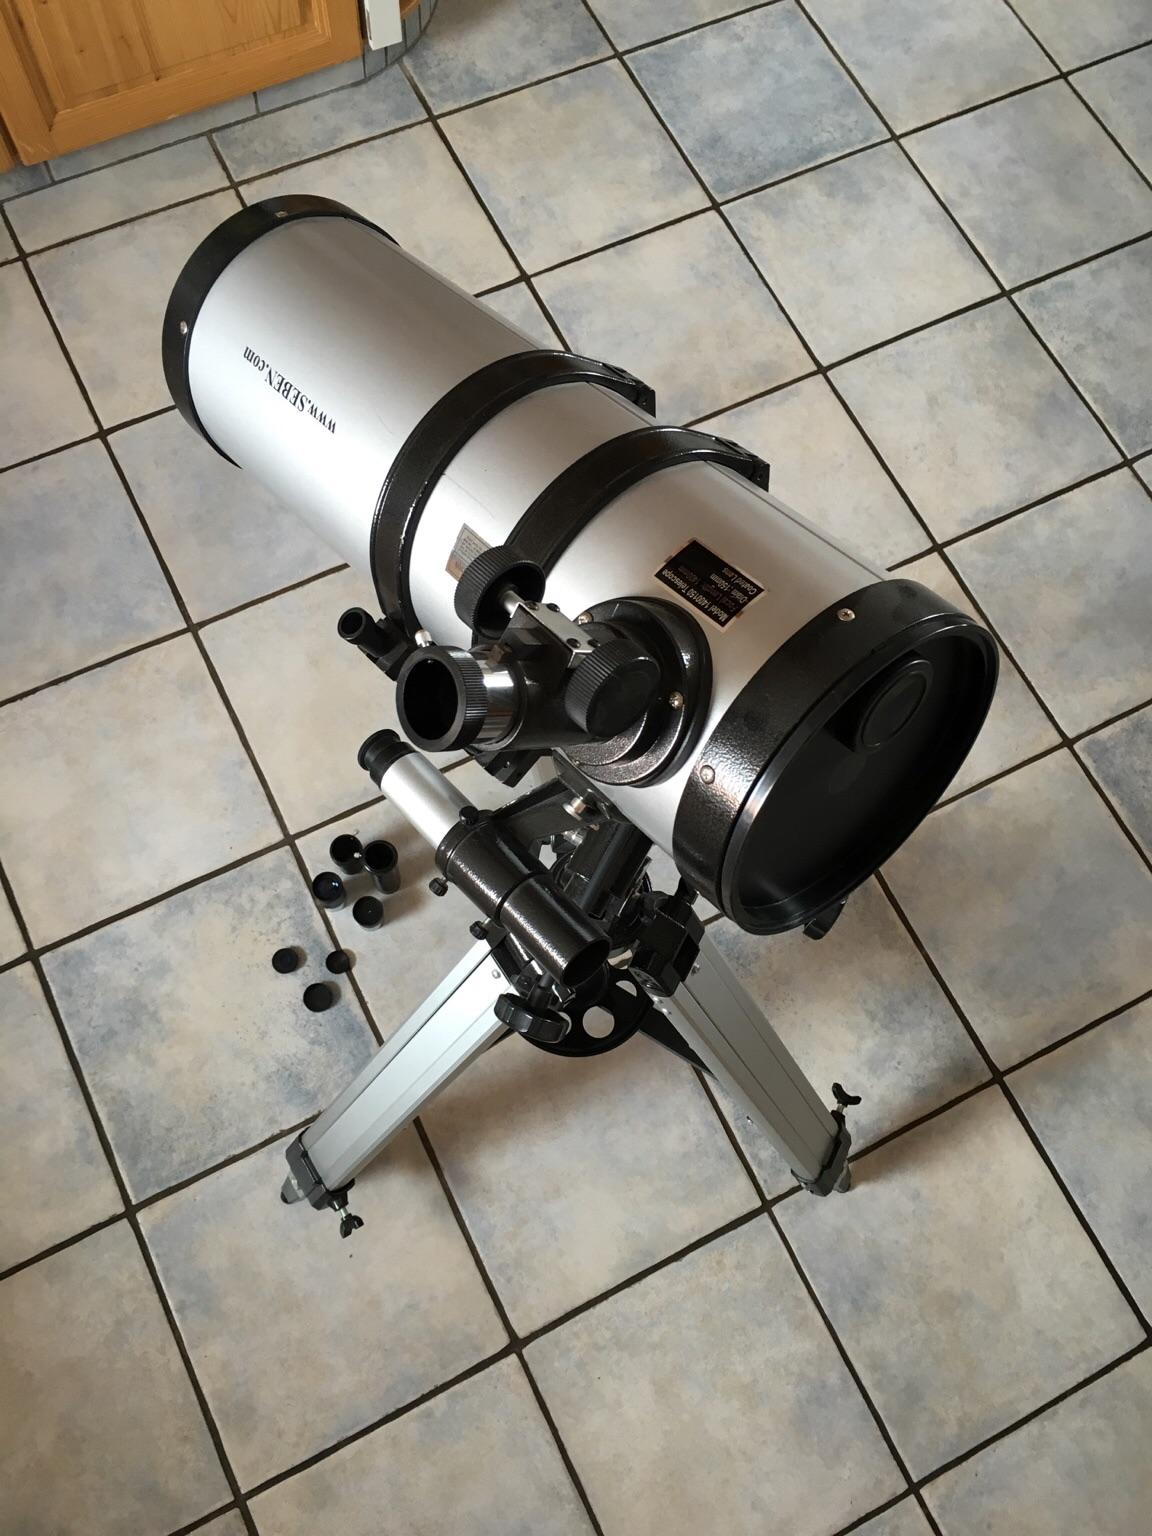 Seben zoom reflektor teleskop star sheriff big amazon